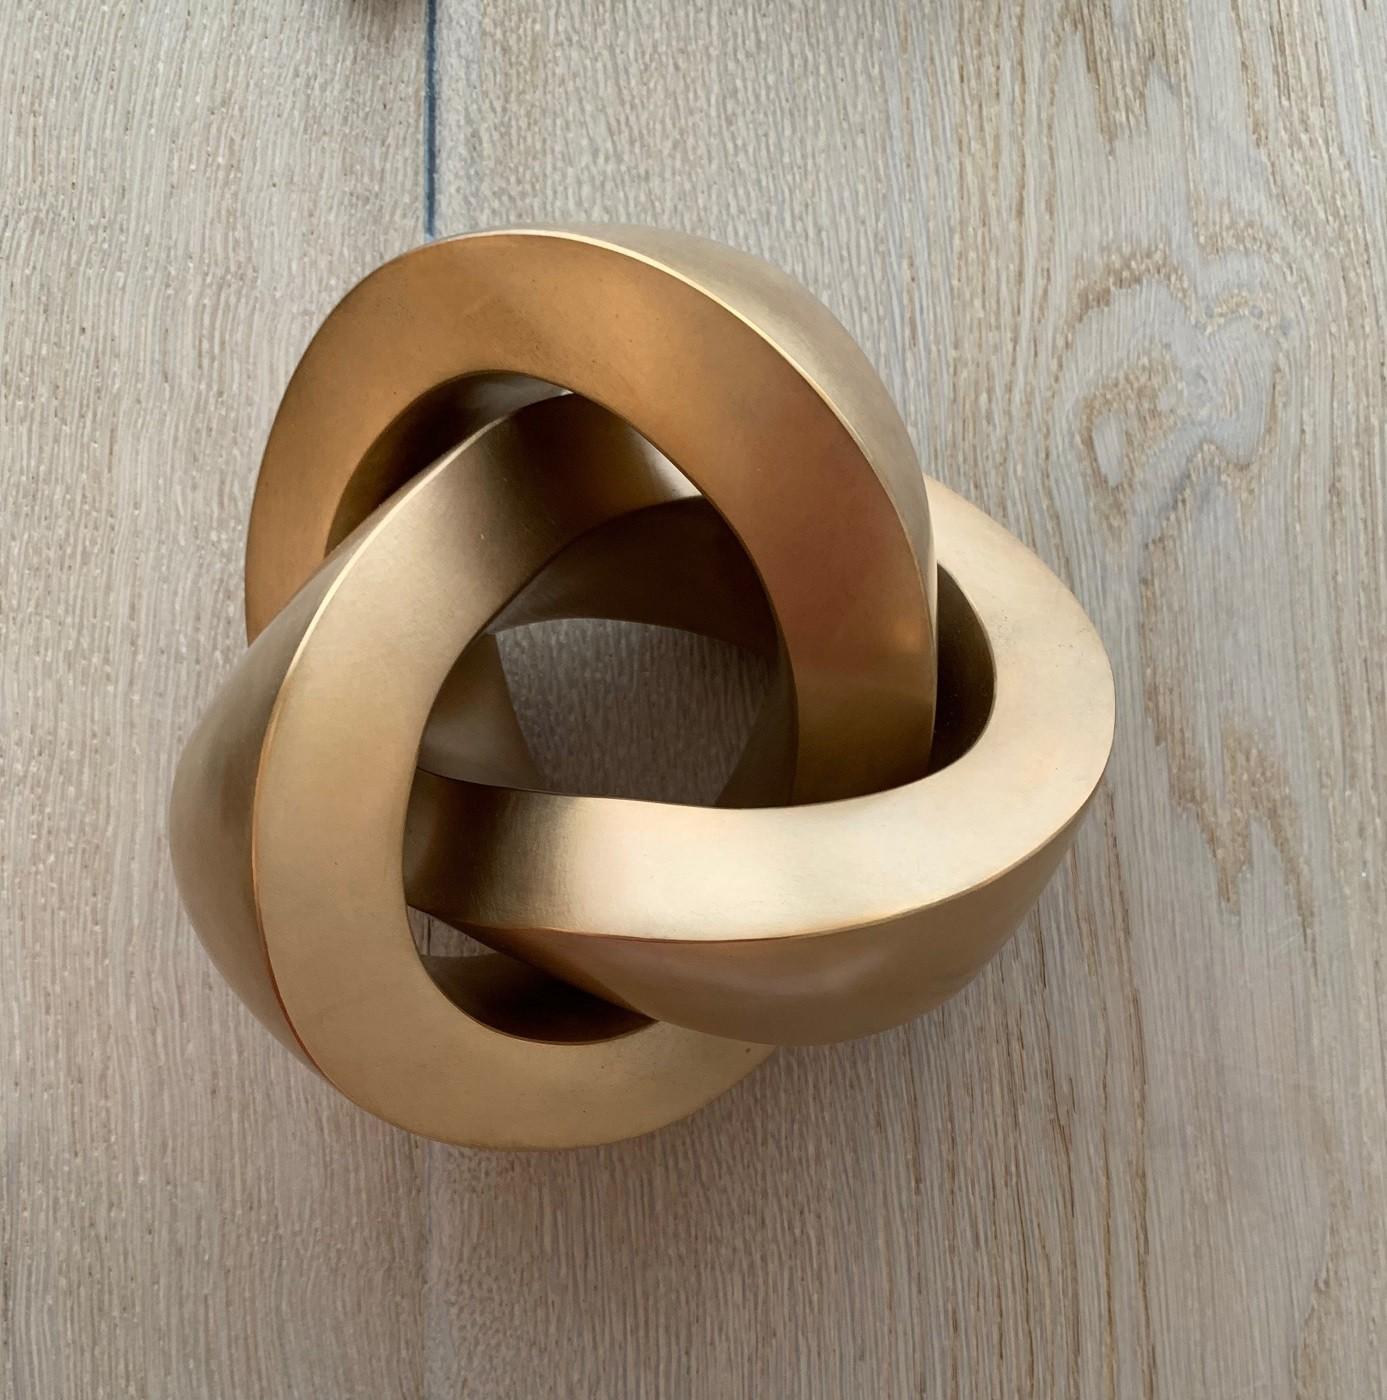 Small Ring of Kerry - Verhas, Maximilian - k-VR108